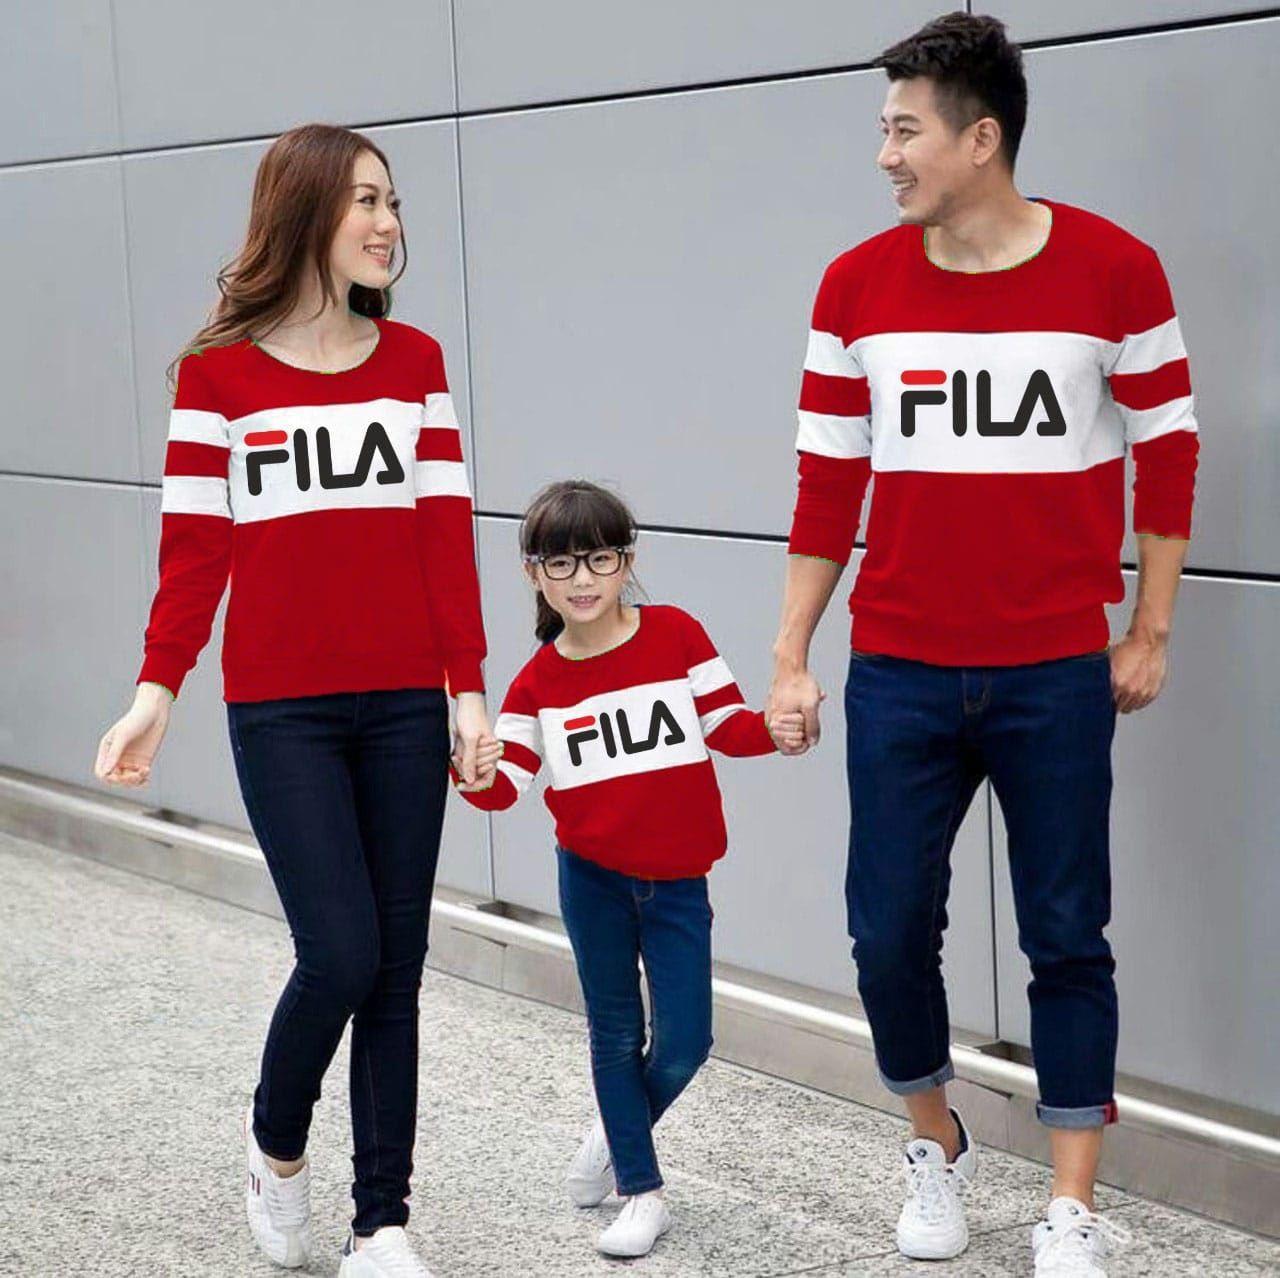 Kaina Shop - Set Jas Rompi Fasya for Kids - Set Baju Anak 2in1Rp69.999. Rp99.999